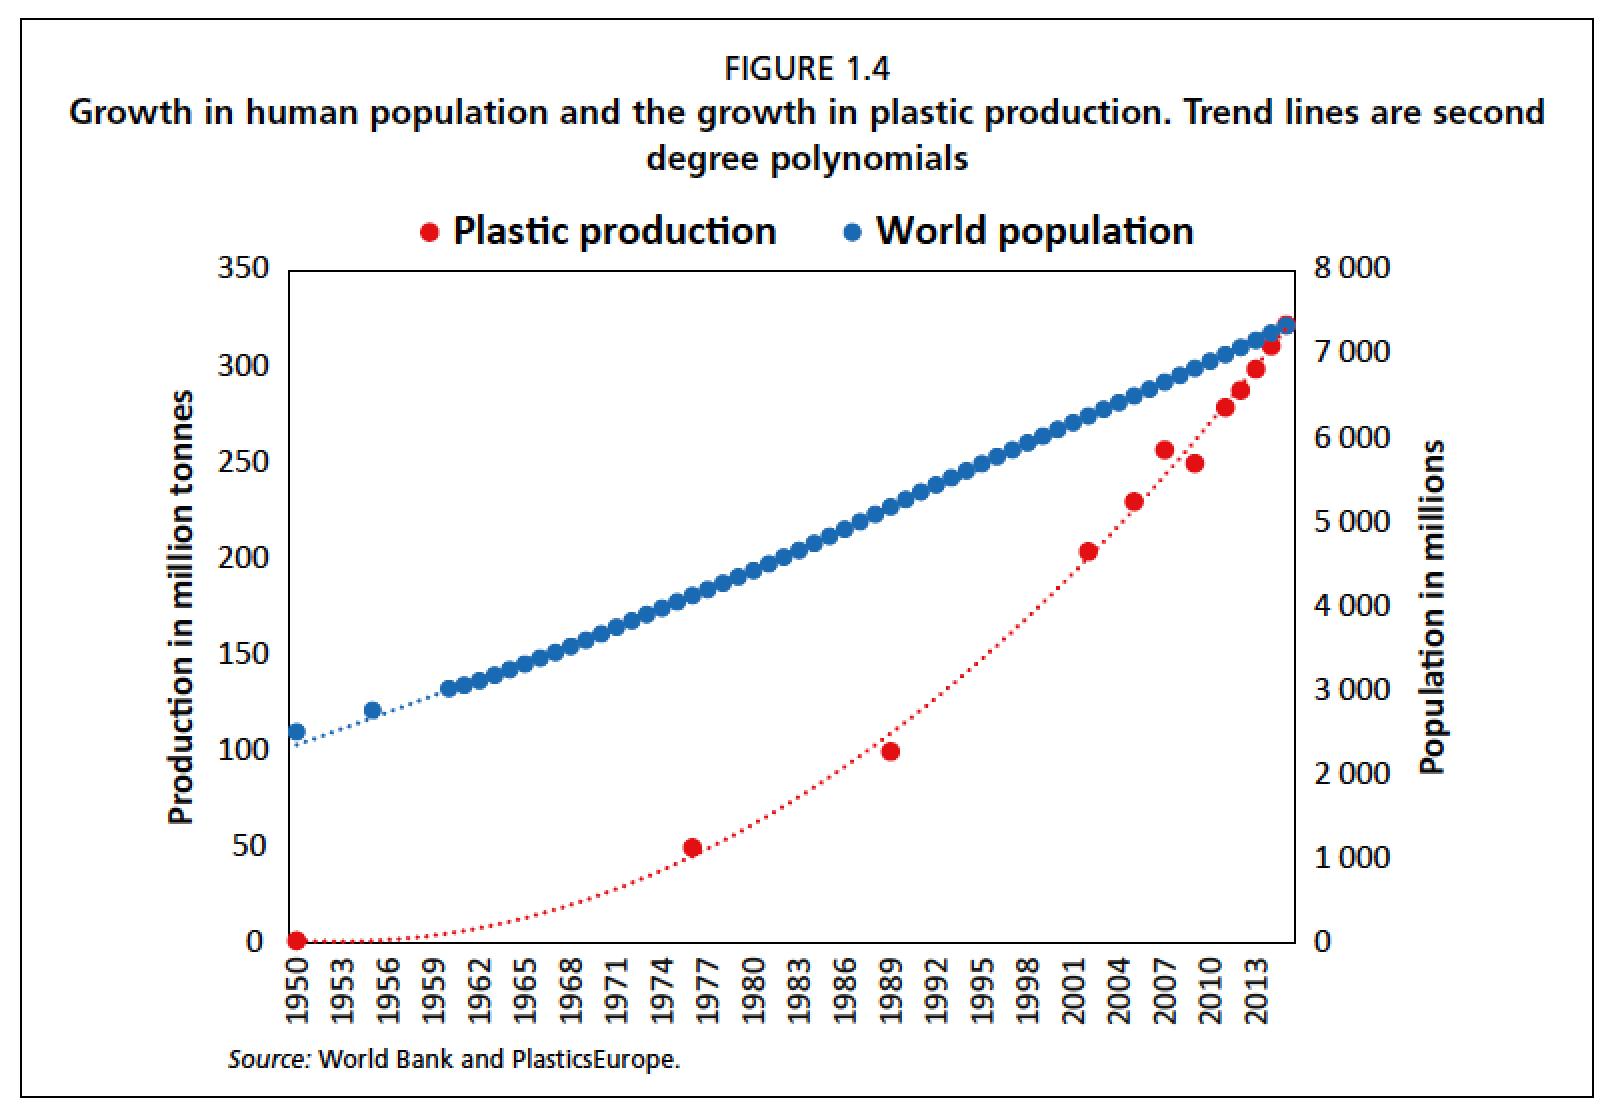 Microplastics in fisheries and aquaculture — Francisco Blaha